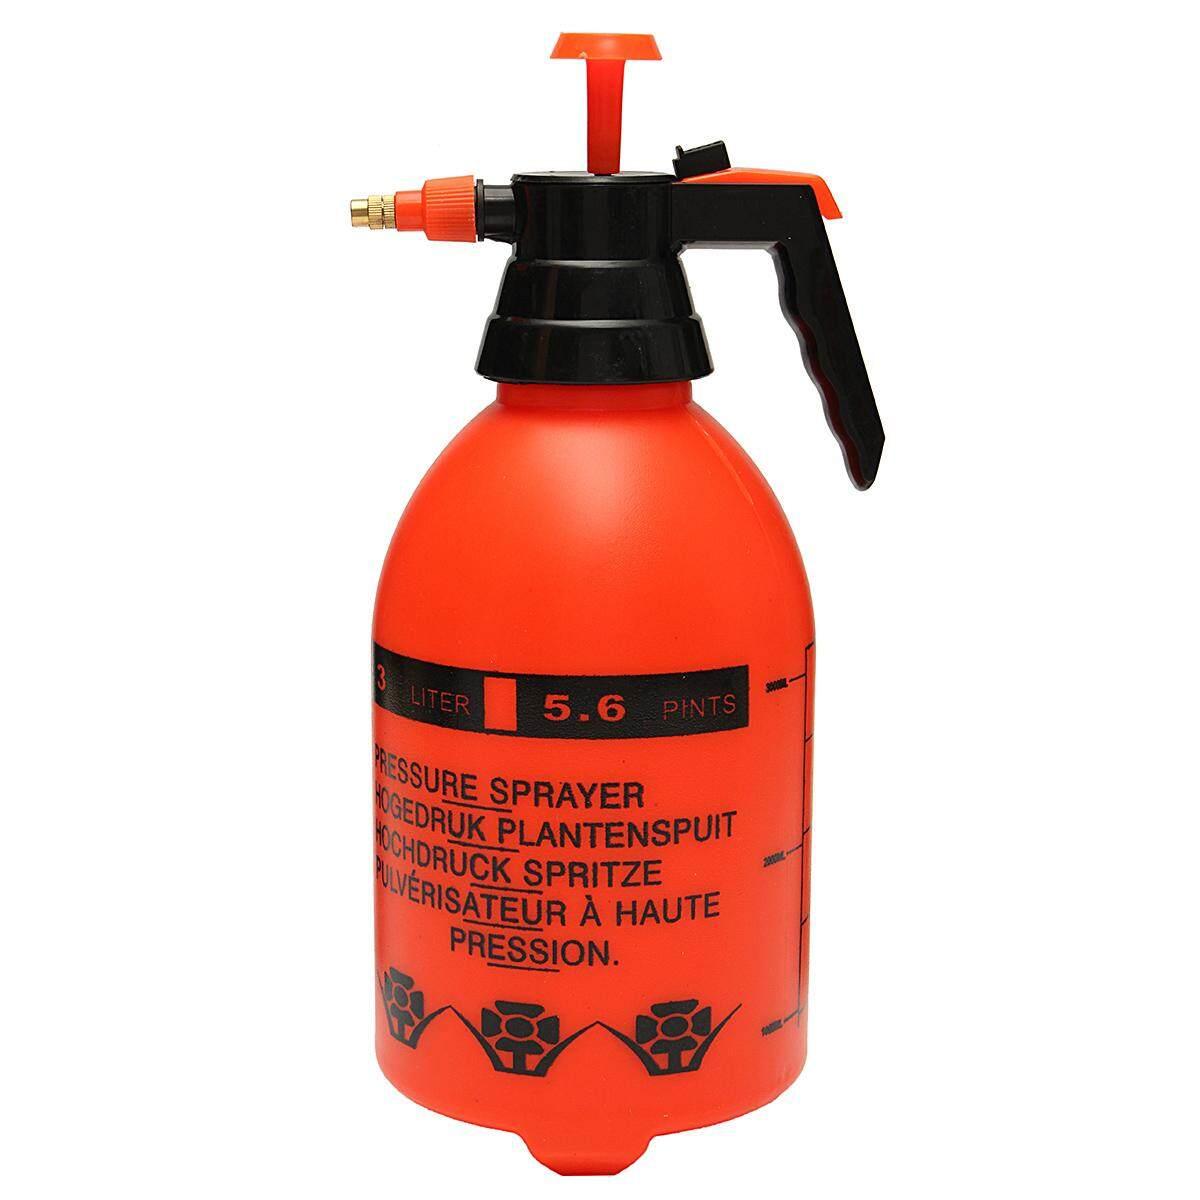 3l Portable Pressure Water Sprayer Pump Handheld Chemical Bottle Garden Tool By Glimmer.